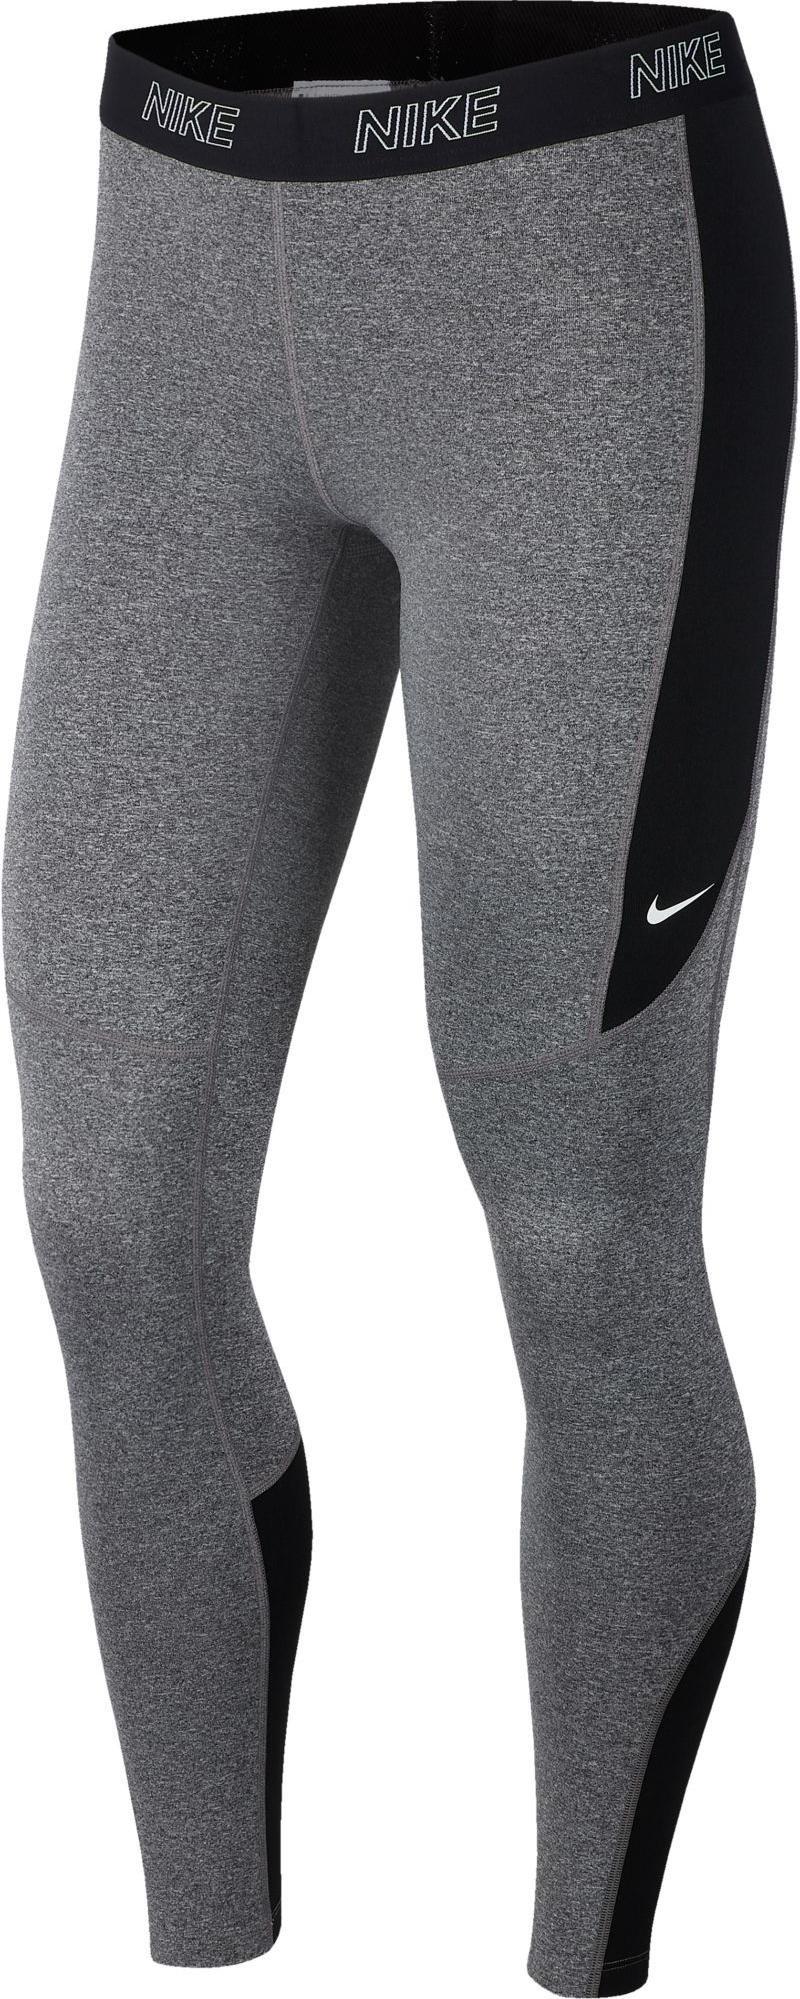 Dámské fitness legíny Nike Dri-FIT Warm Curve